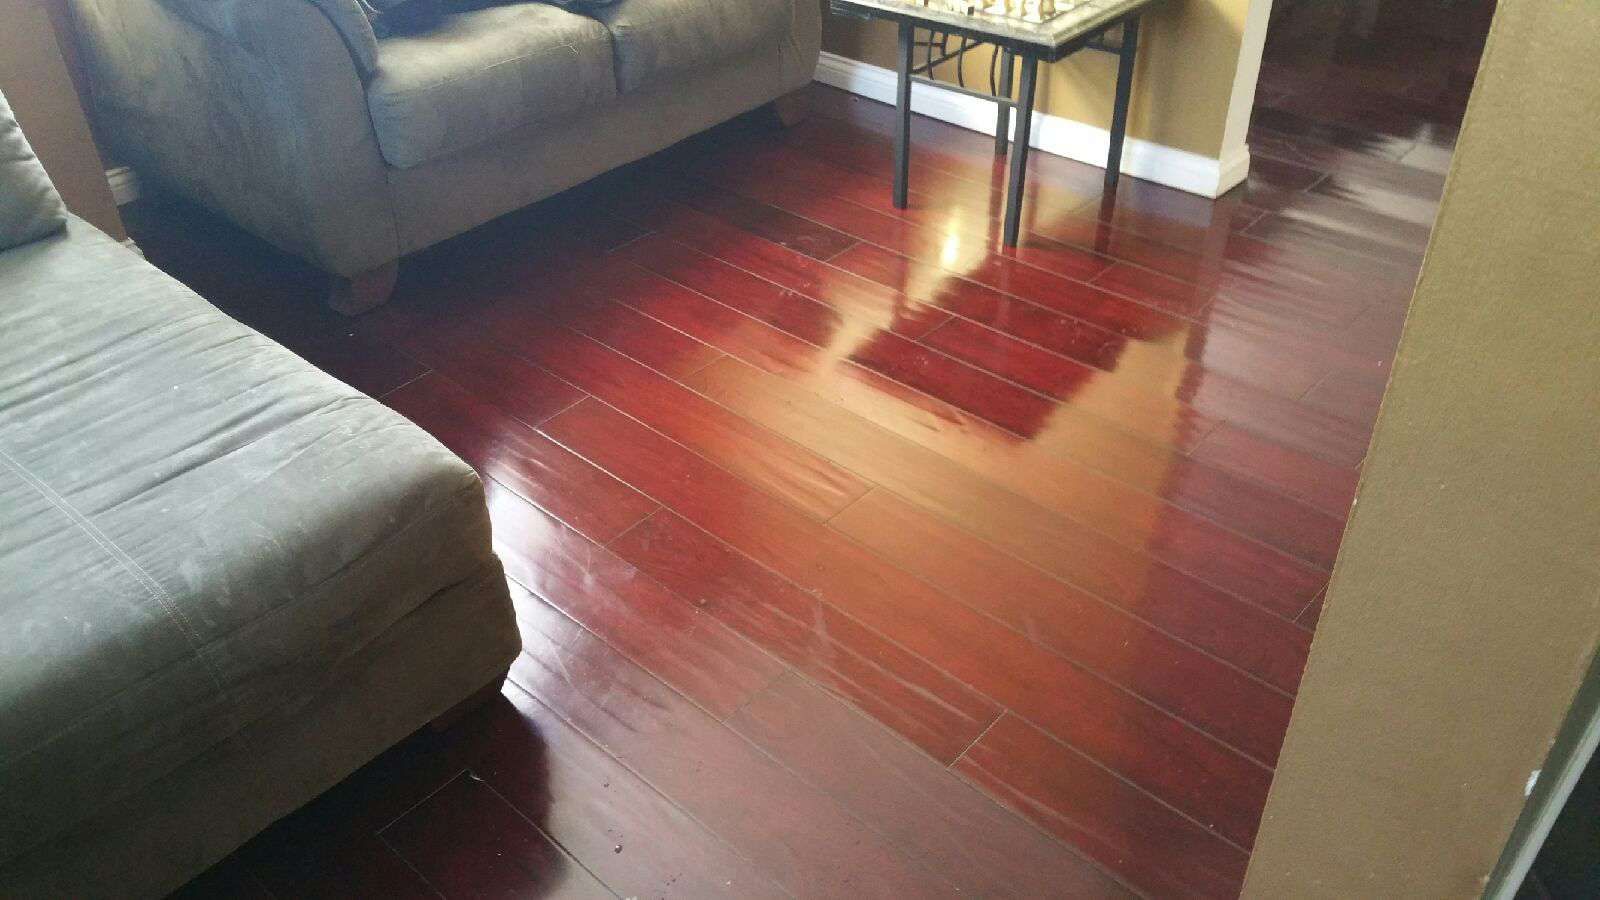 Newly installed dark wood flooring  in Cincinatti